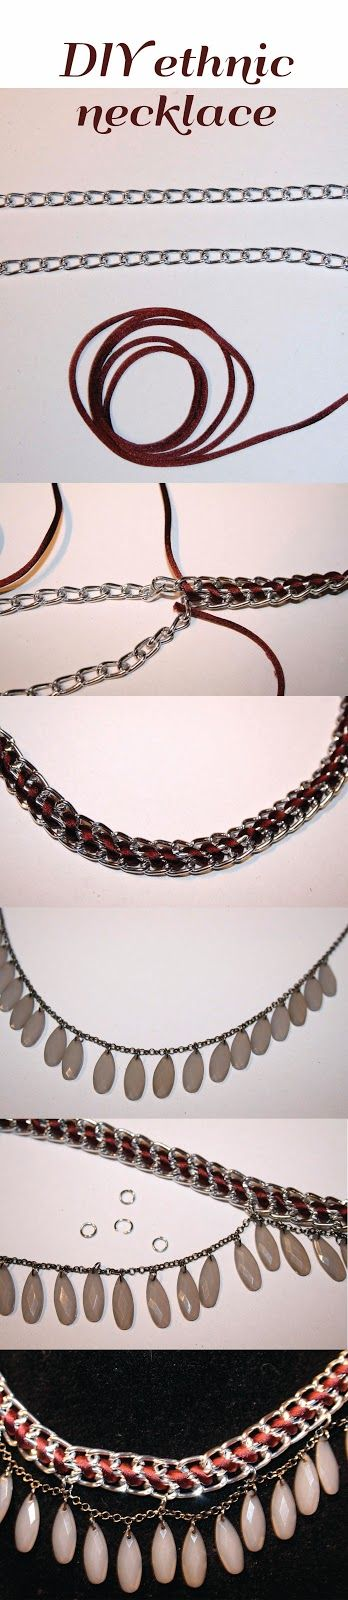 Happy Home Made Stuff: jewelry